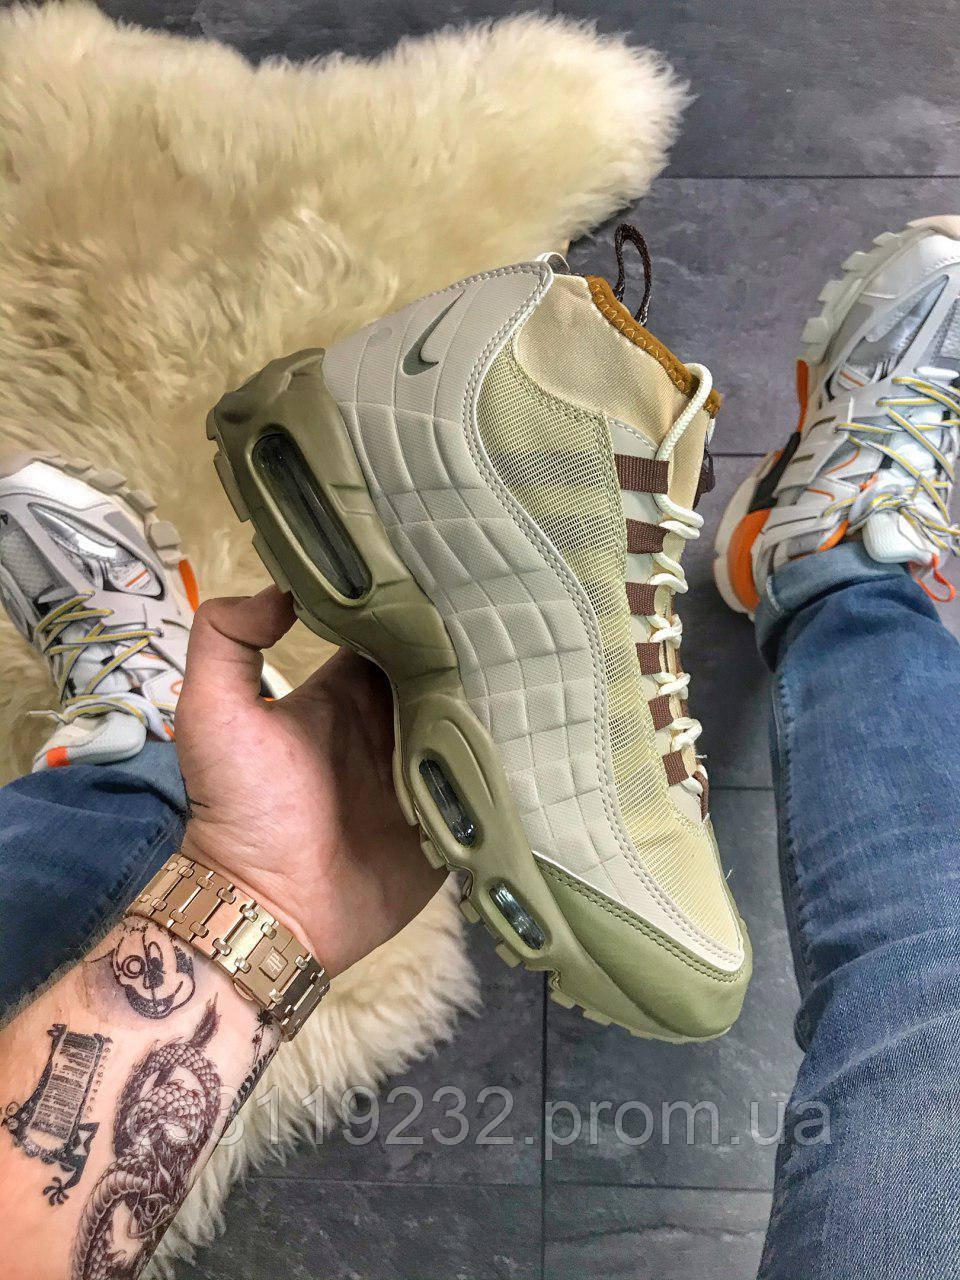 Мужские кроссовки (еврозима) Nike Air Max 95 Sneakerboot Green(зелёный)